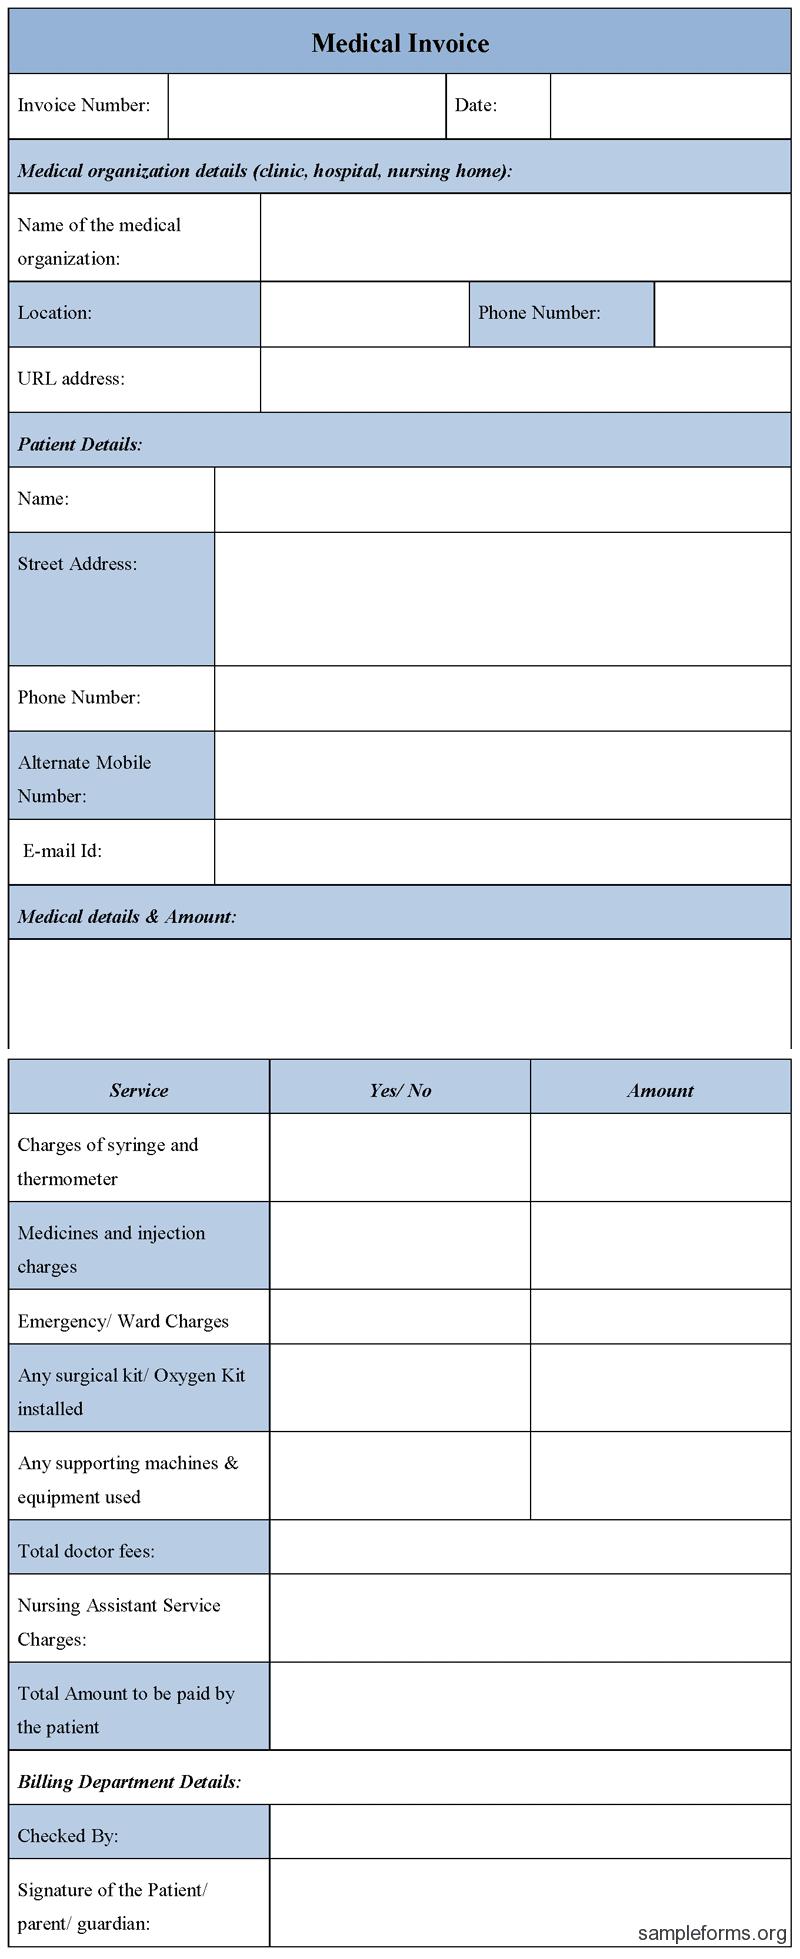 Medical Invoice Template Microsoft